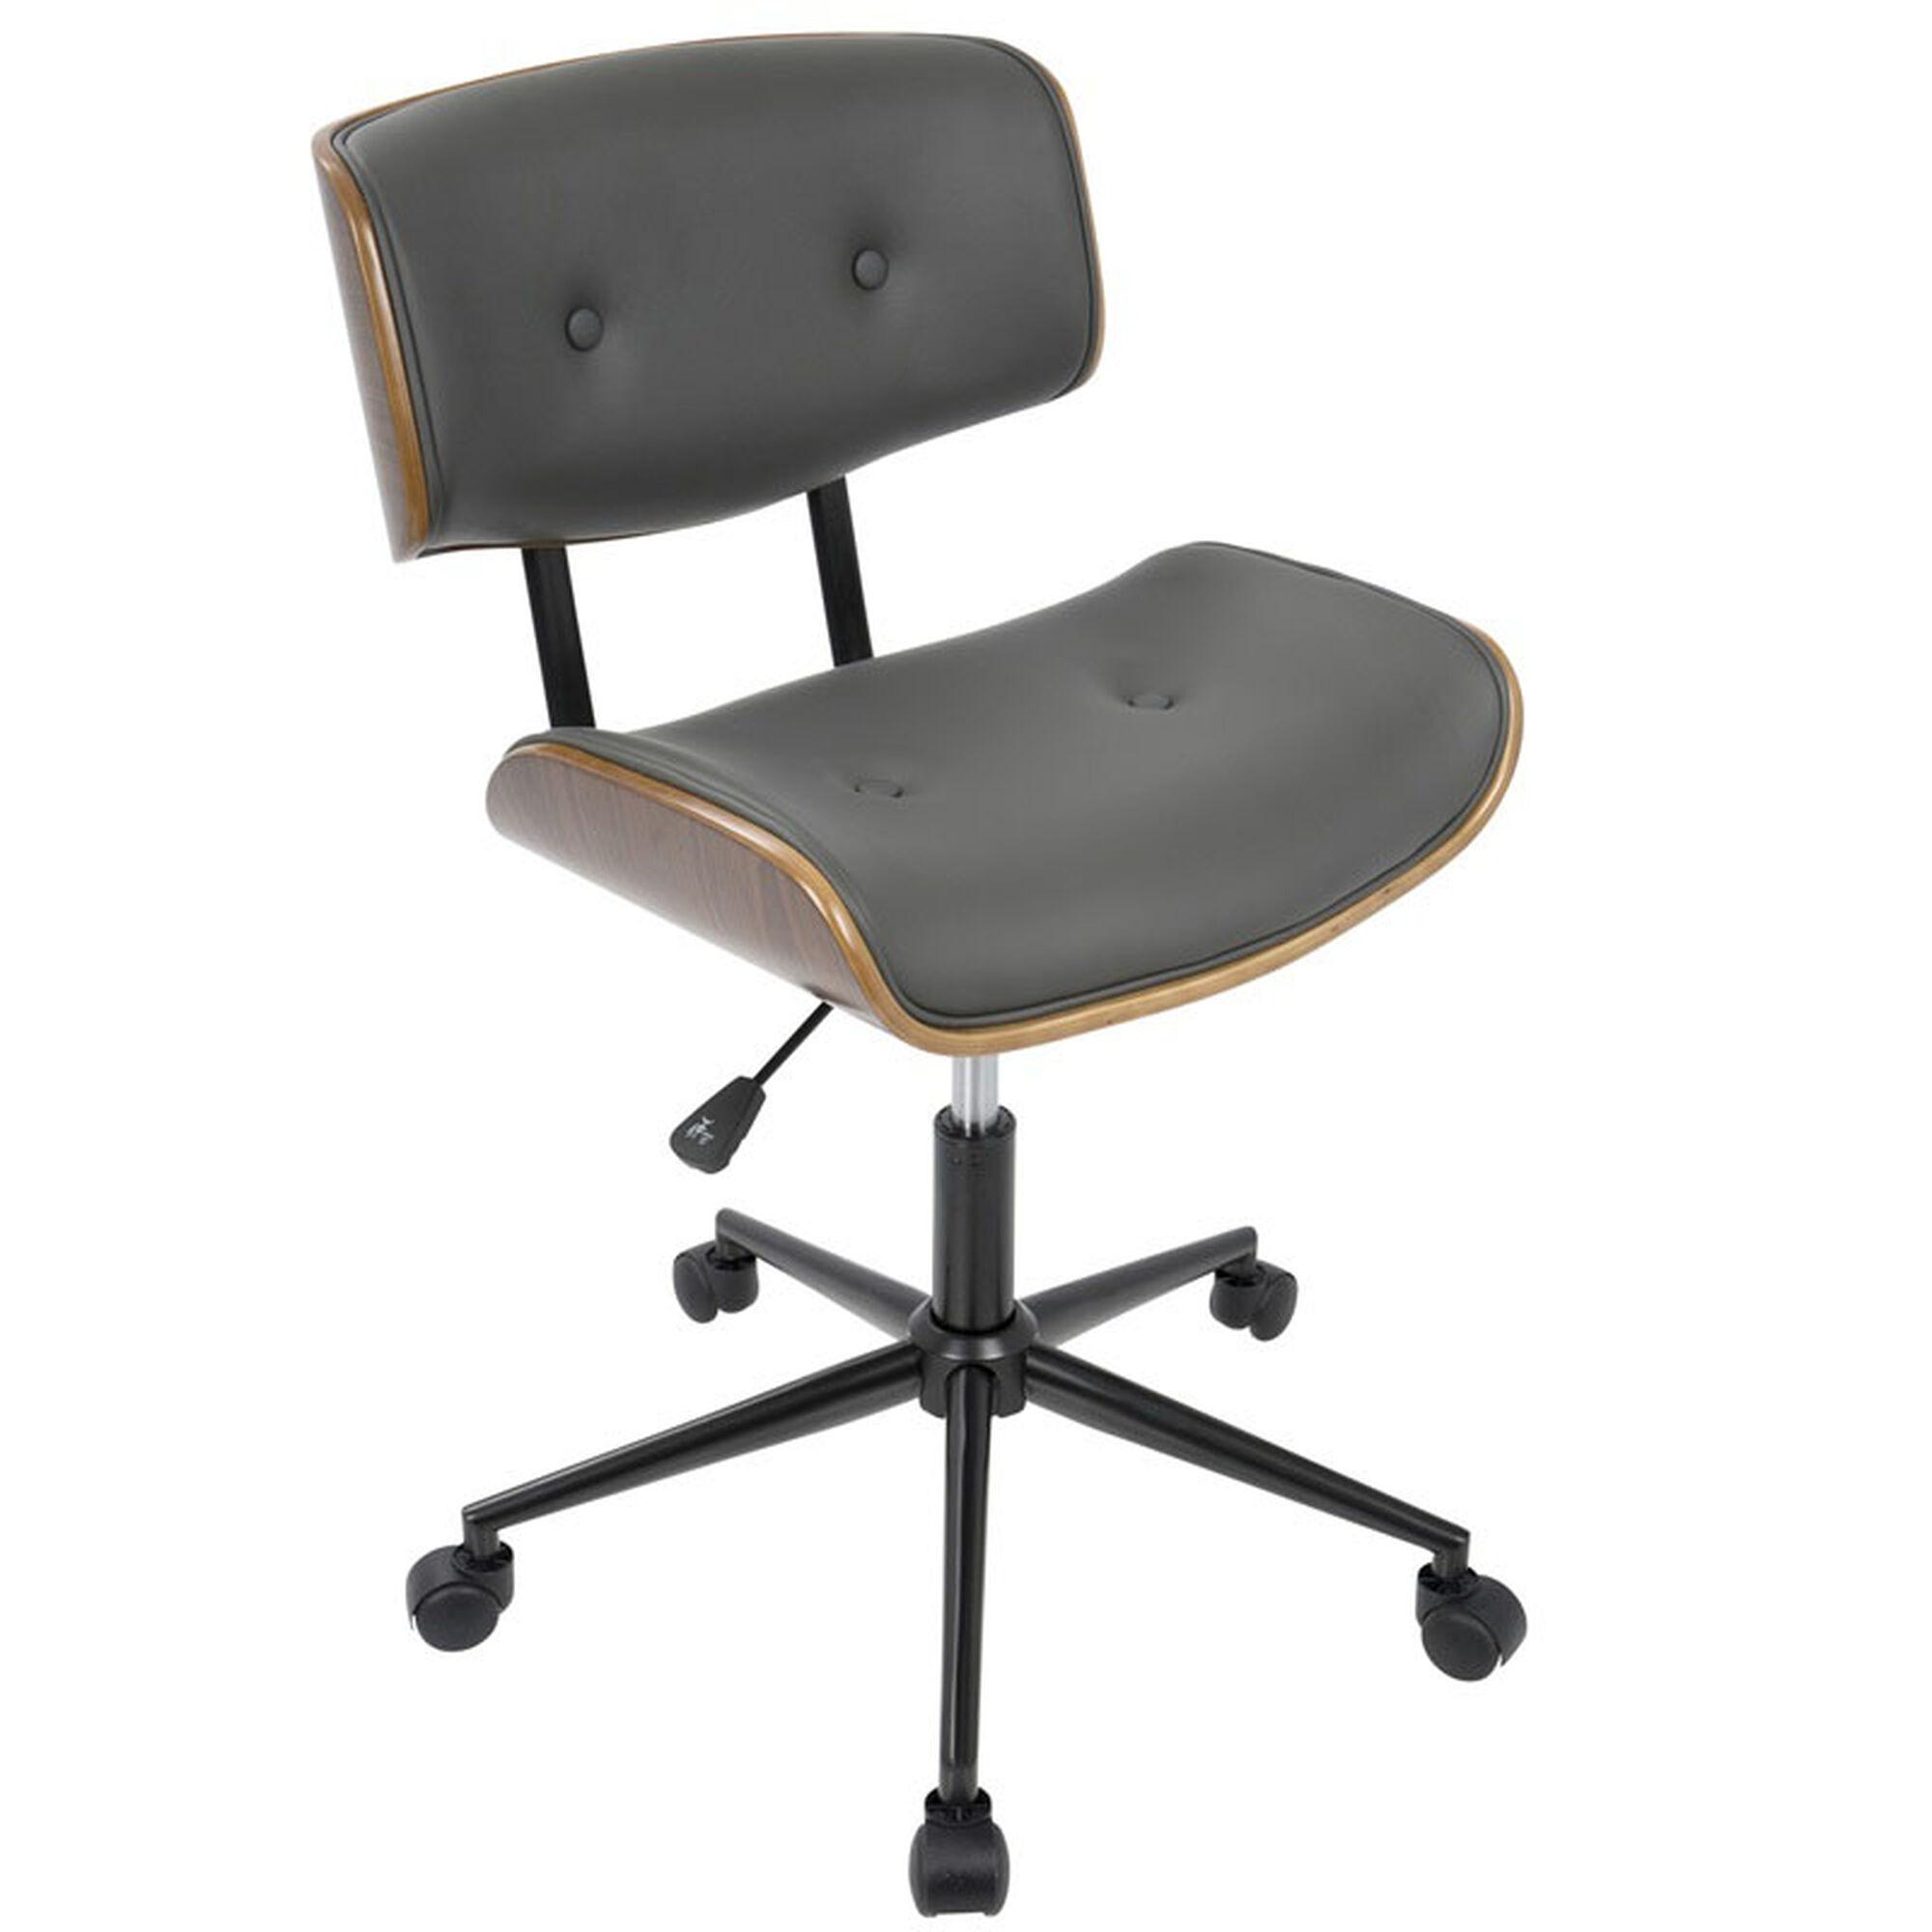 Lombardi Grey Office Chair Oc Jy Lmb Wl Gy Bizchaircom